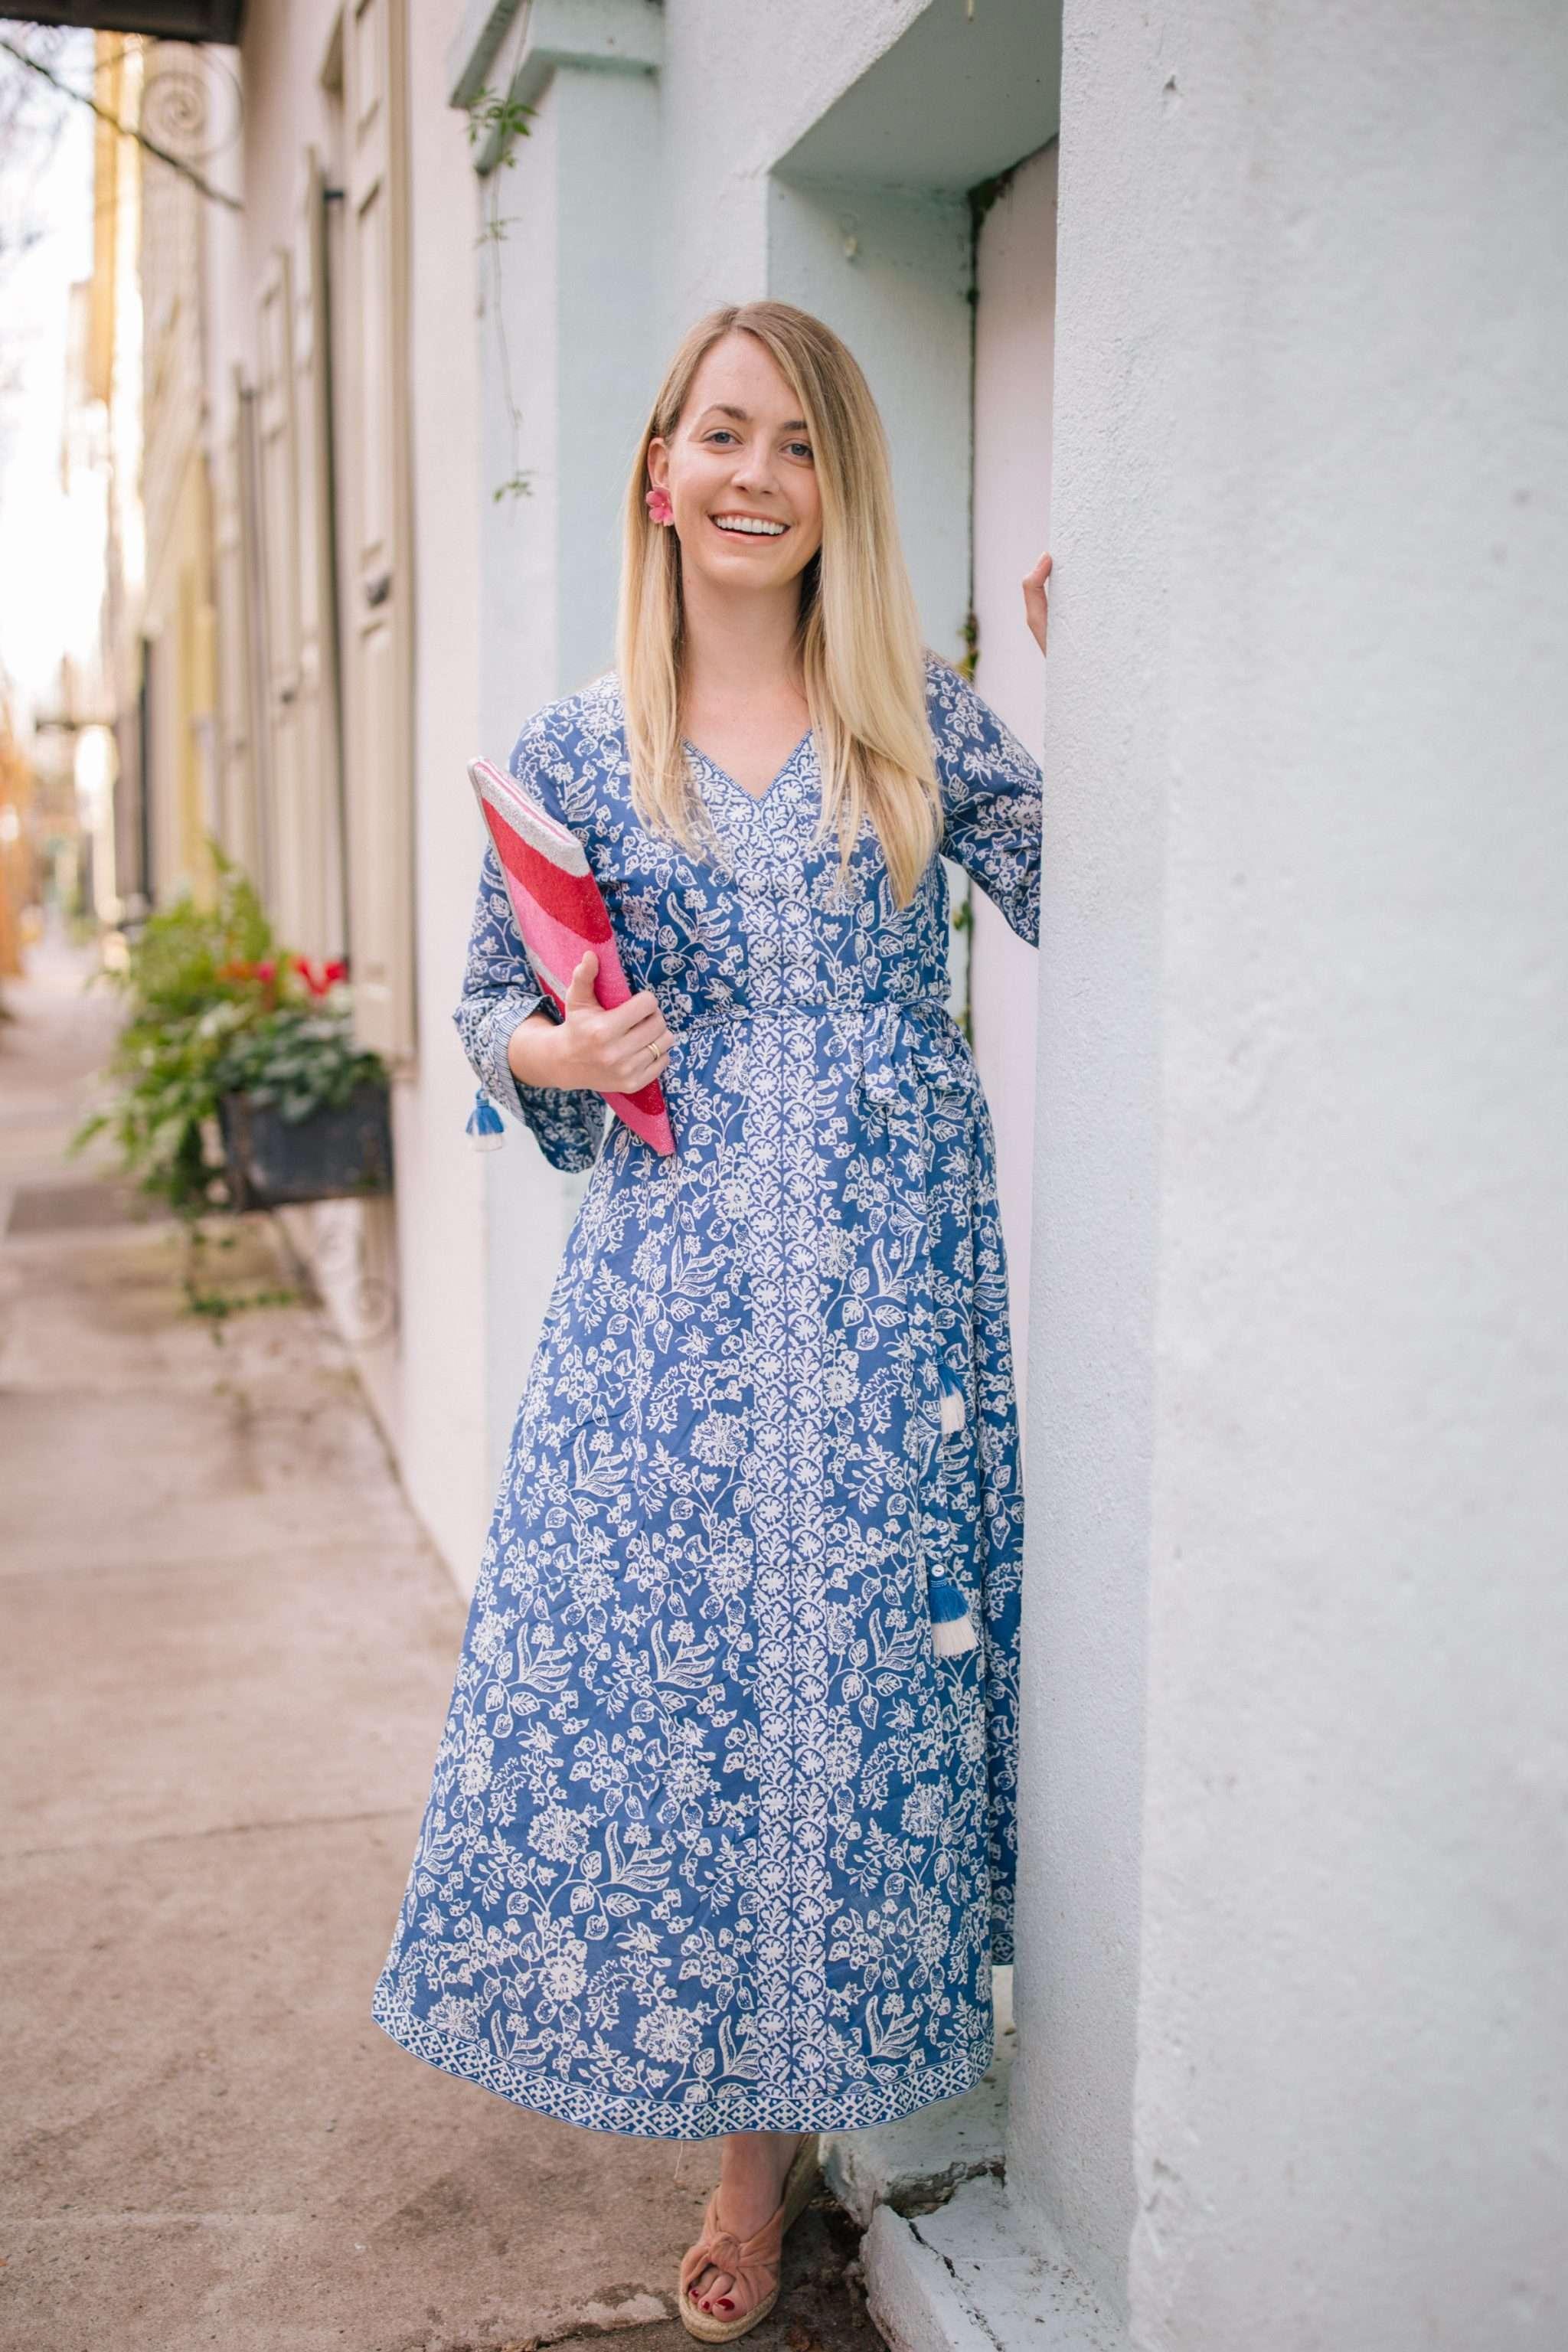 resort wear dresses for weddings | Rhyme & Reason